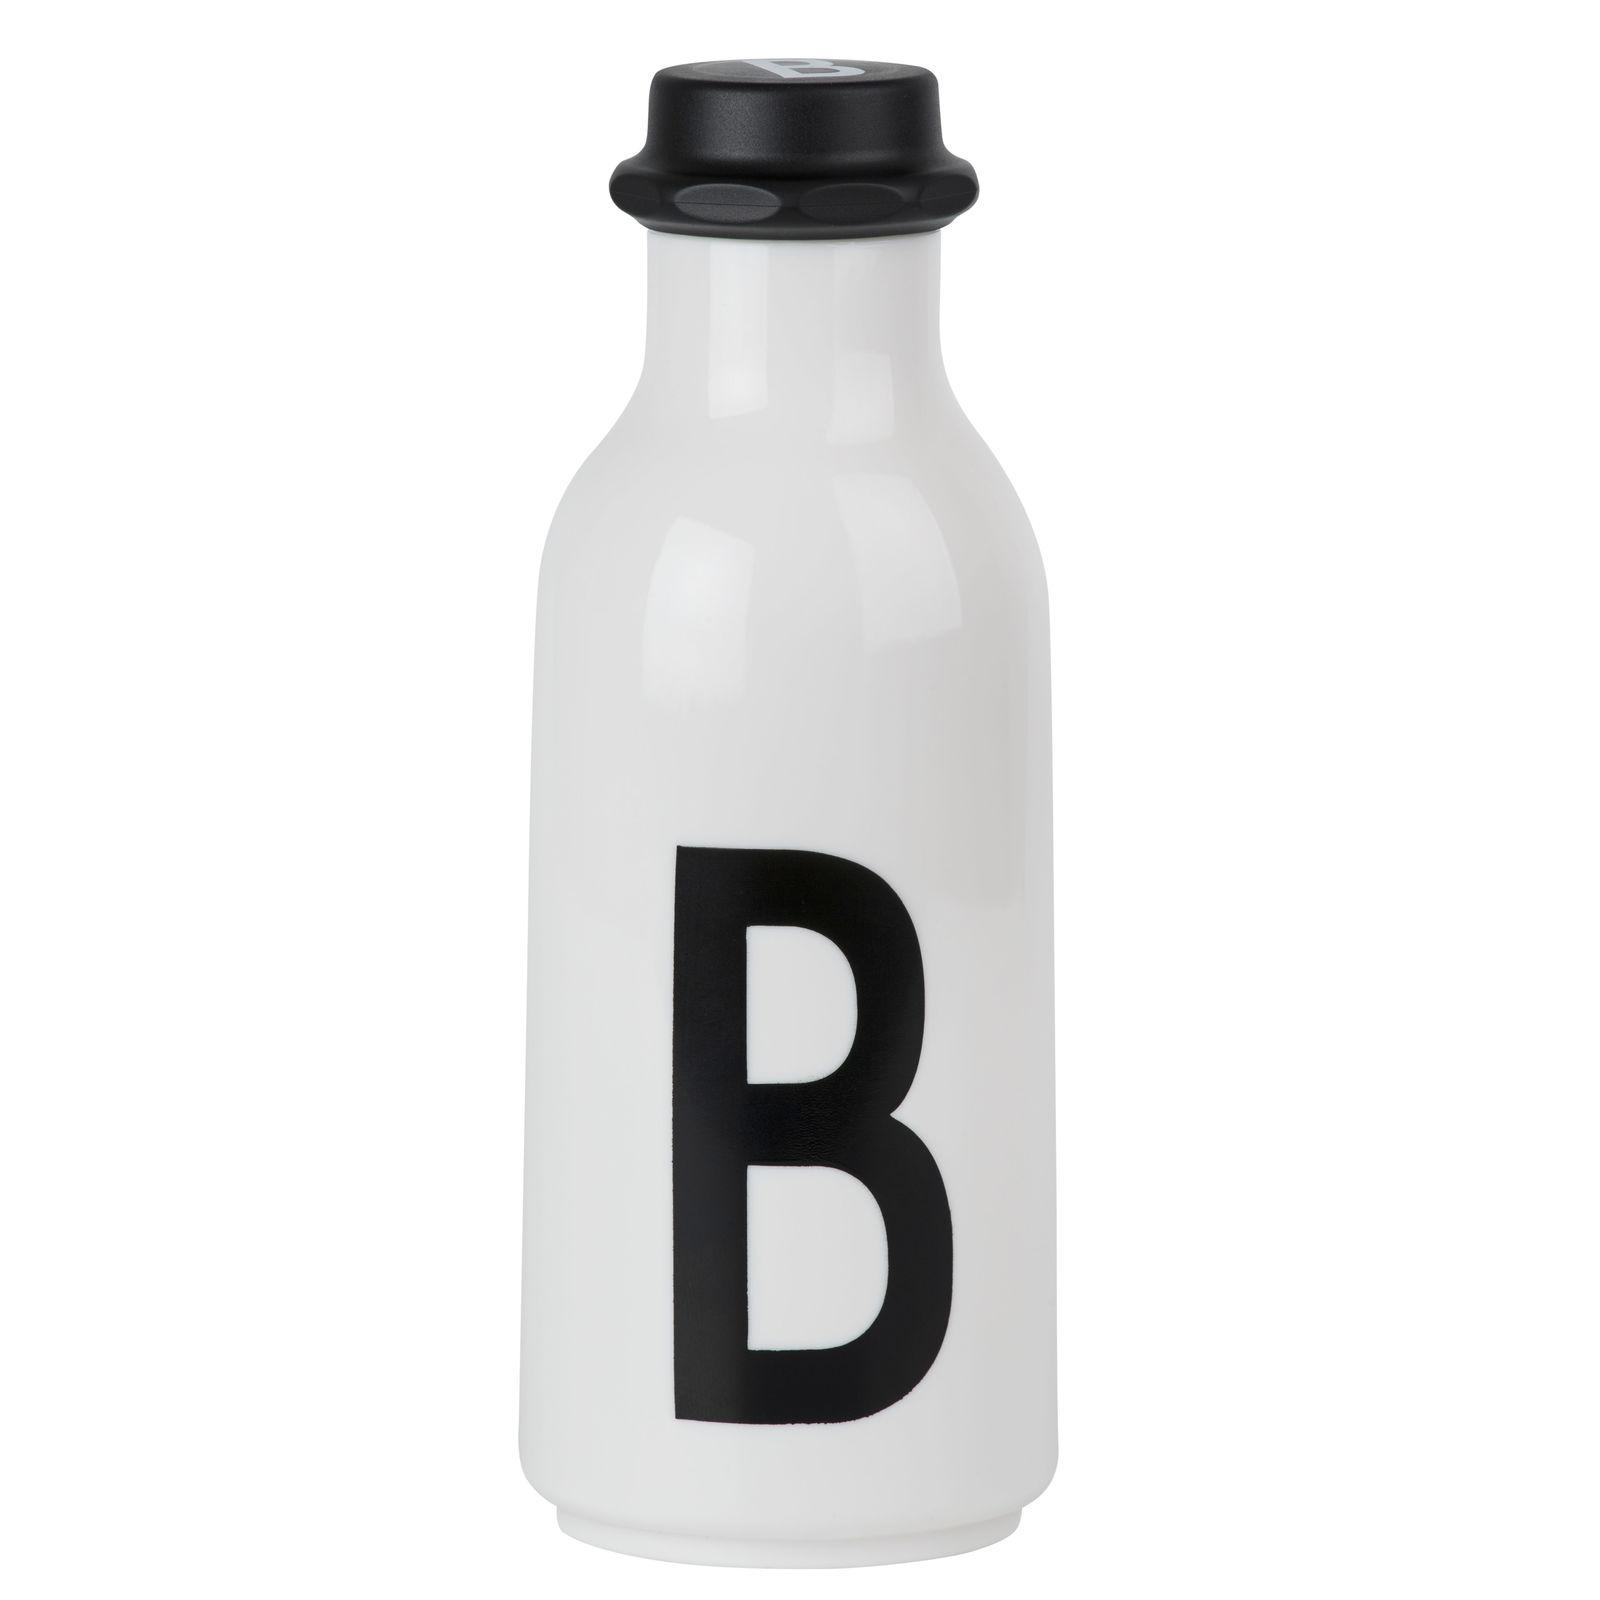 Design Letters - Personal Drinking Bottle - B (20202500B)